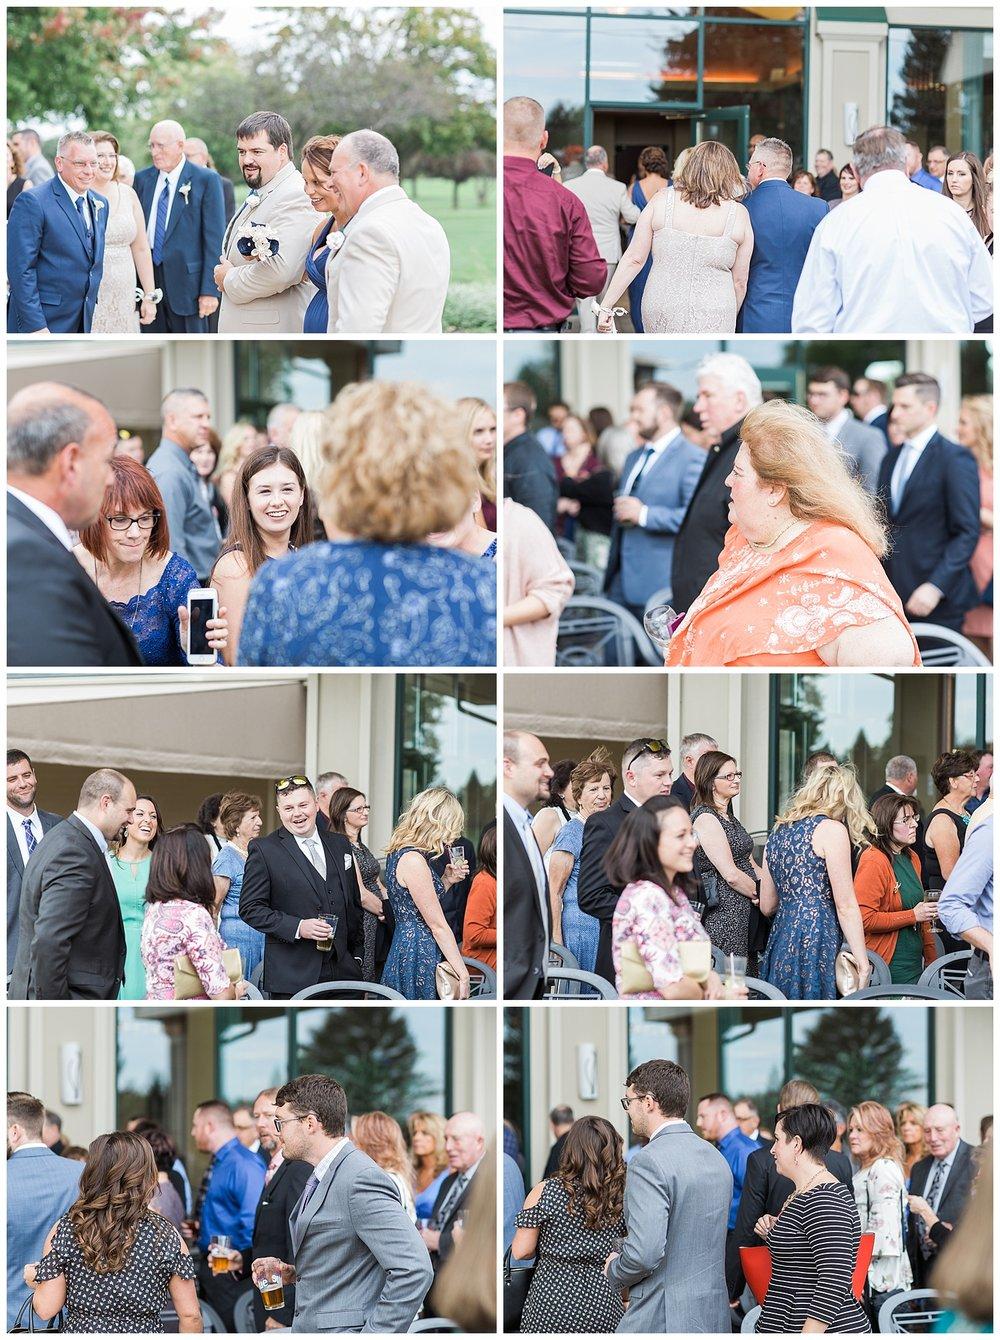 Jessica and Scott McKay - Terry Hills Golf Course - Batavia NY - Lass and Beau-634_Buffalo wedding photography.jpg